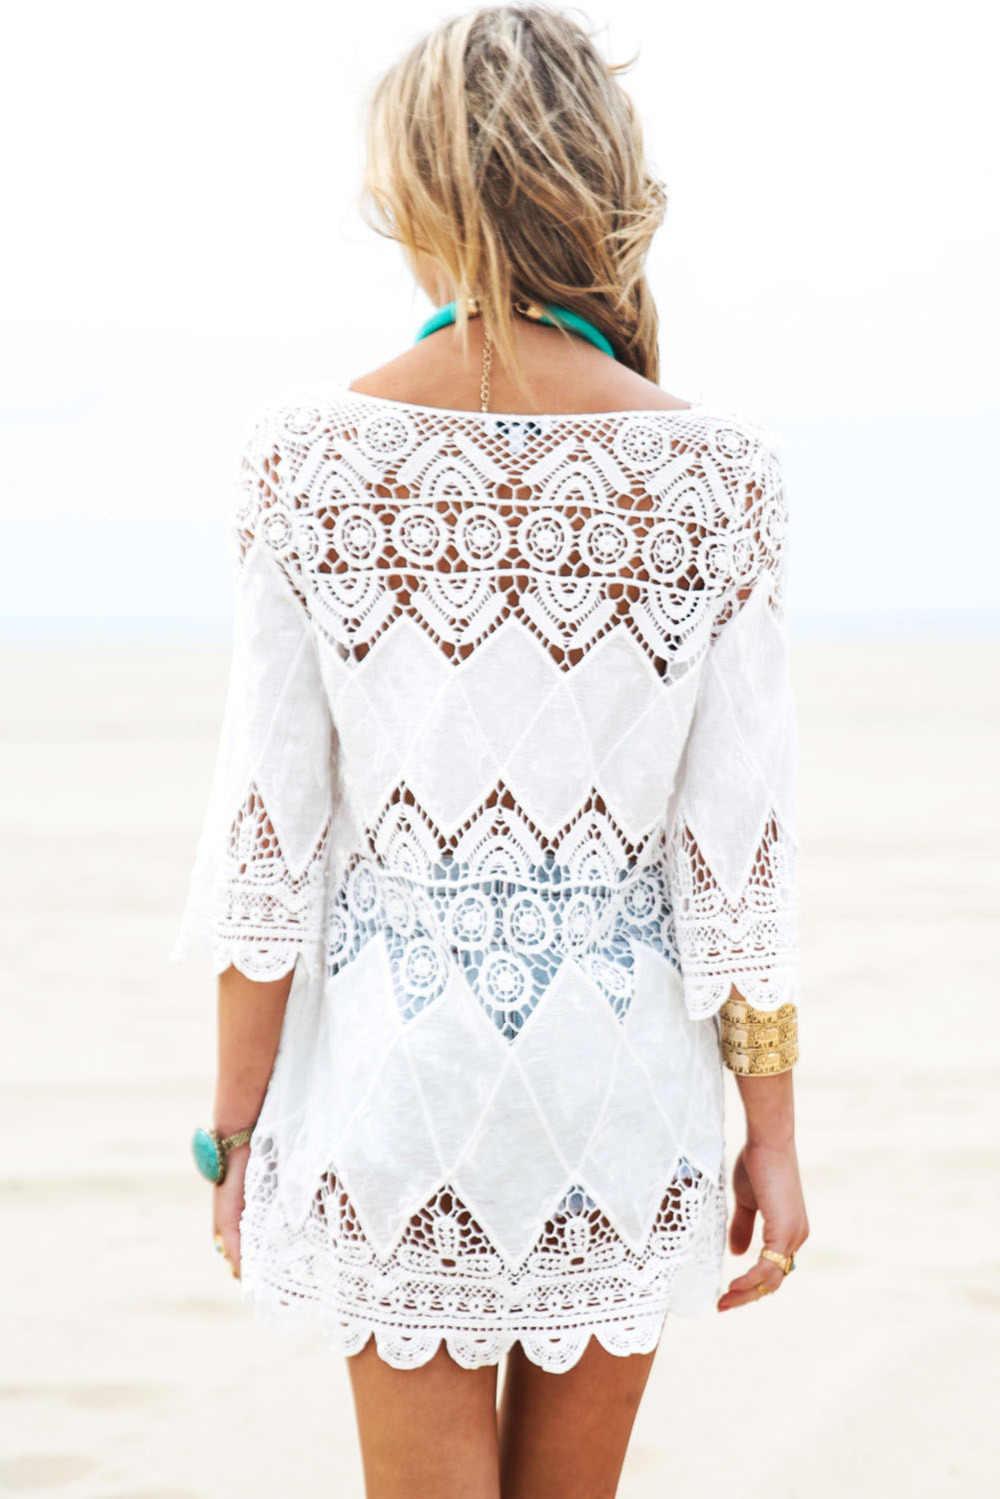 f795dd7e8d ... New Women Hawaiian Vestido Beach Dresses Lace Angel White Lace-up  Crochet Knit Honeycomb Beachwear ...